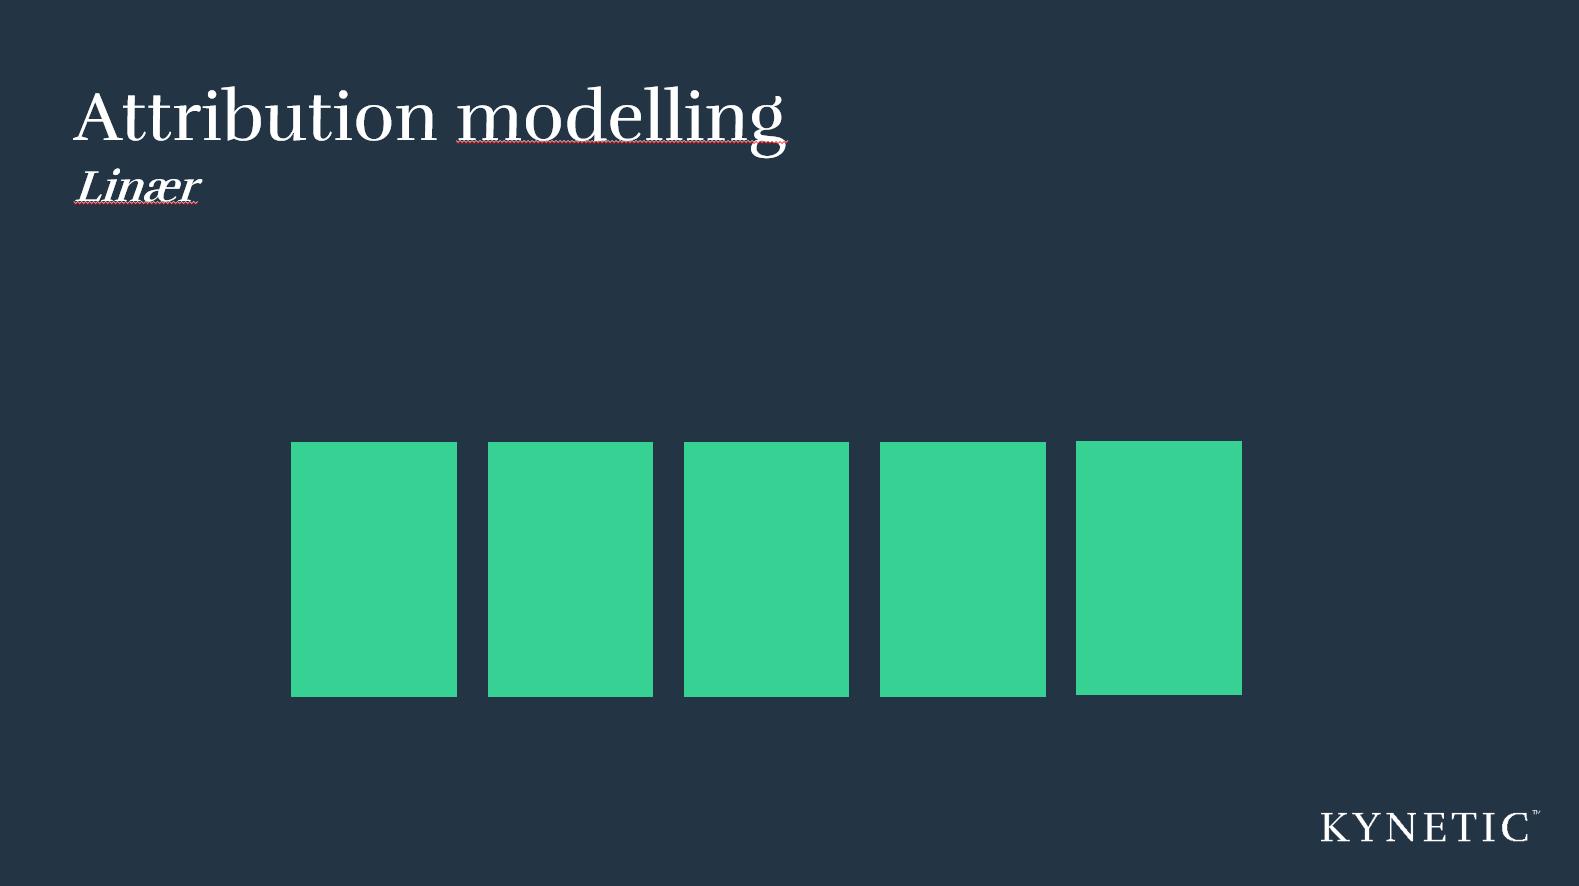 Linær attribution modelling